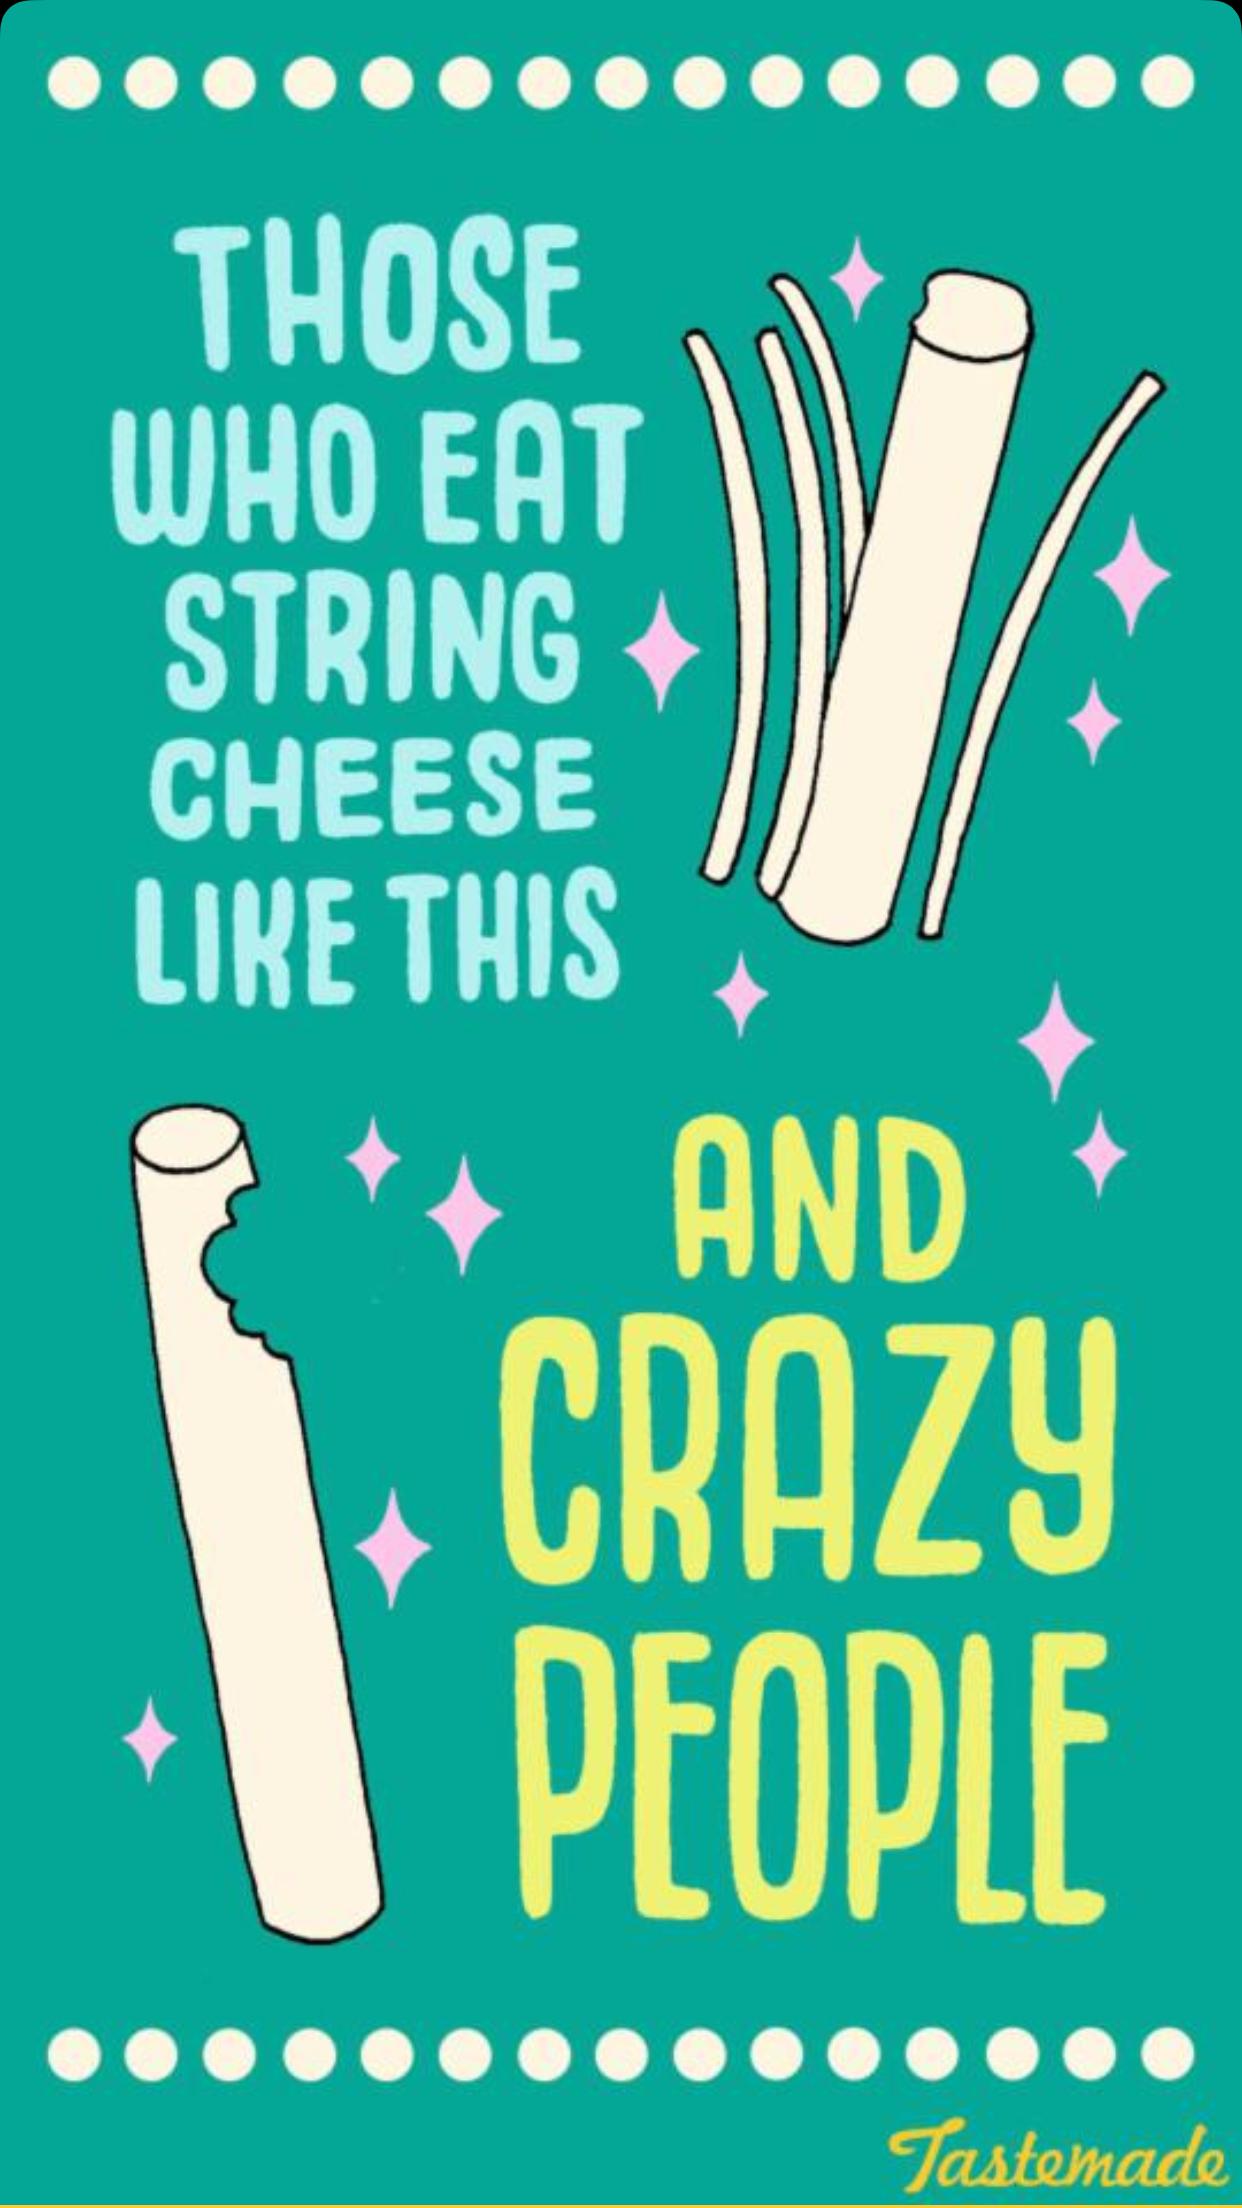 Tastemade illustrations for their snapchat Tastemade